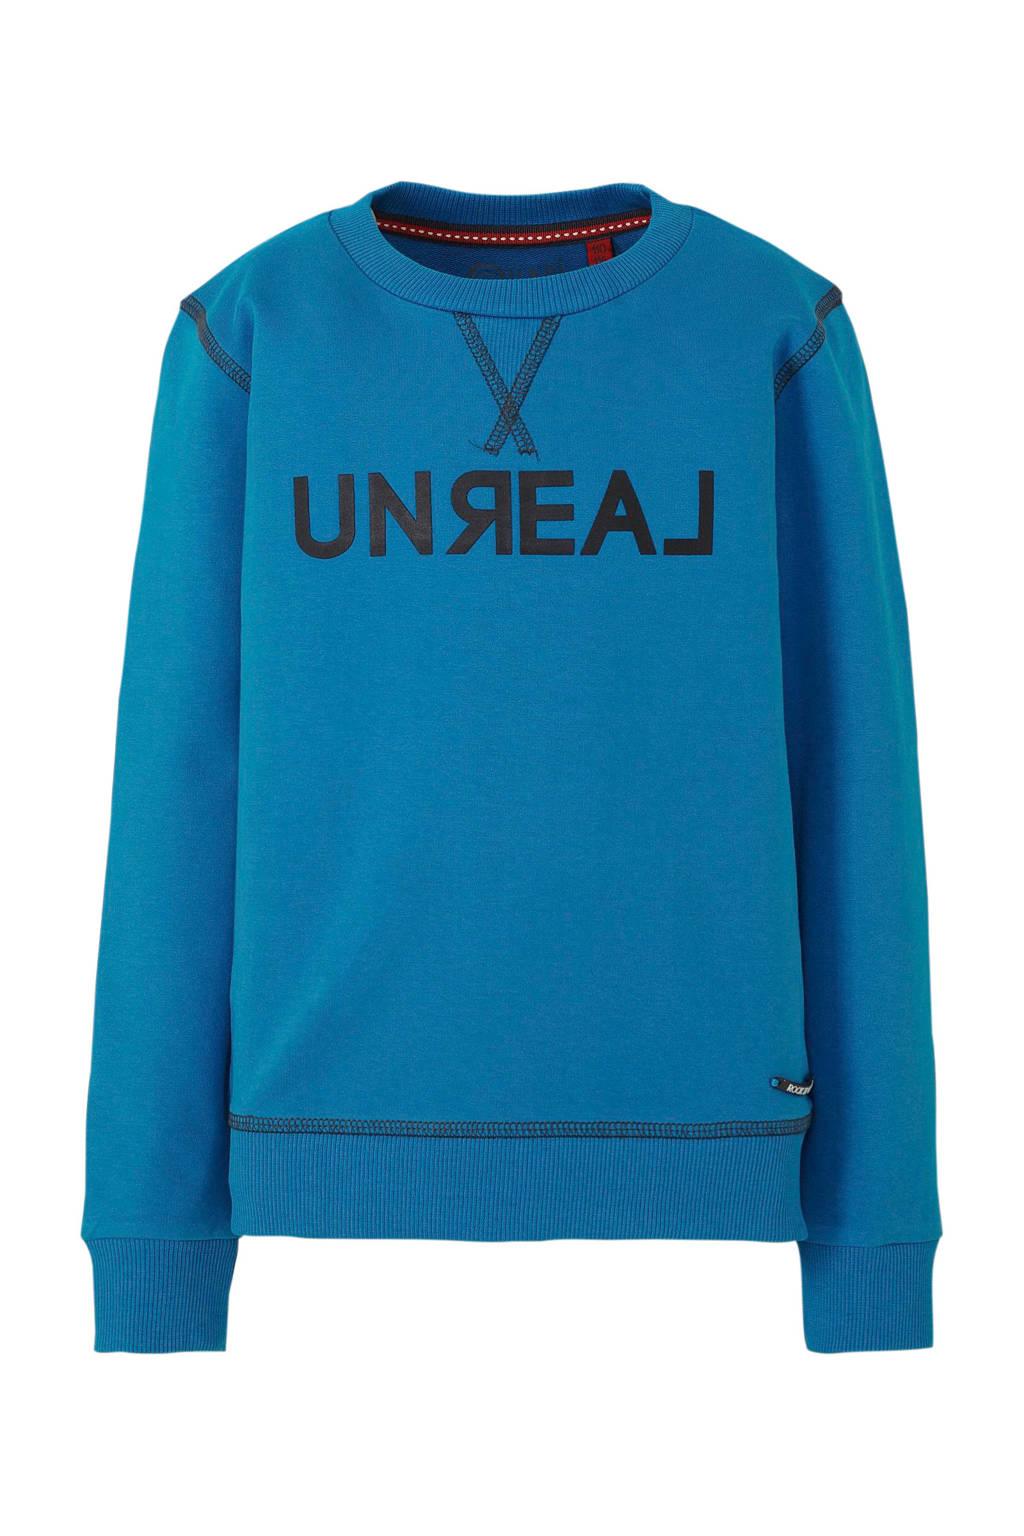 Quapi sweater met tekst blauw, Blauw